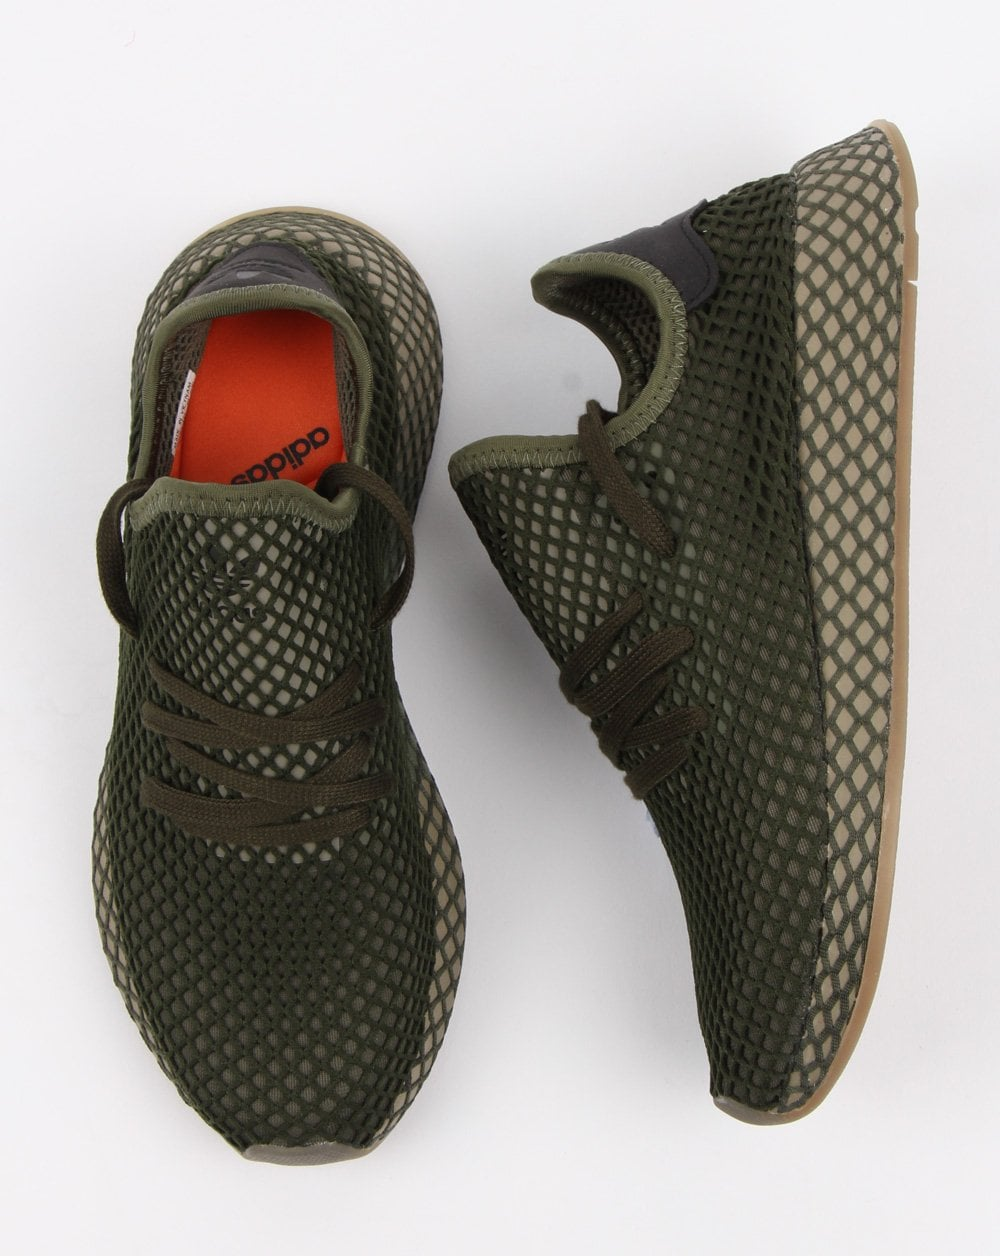 cb4b72786 Adidas Deerupt Runner Trainers Base Green orange